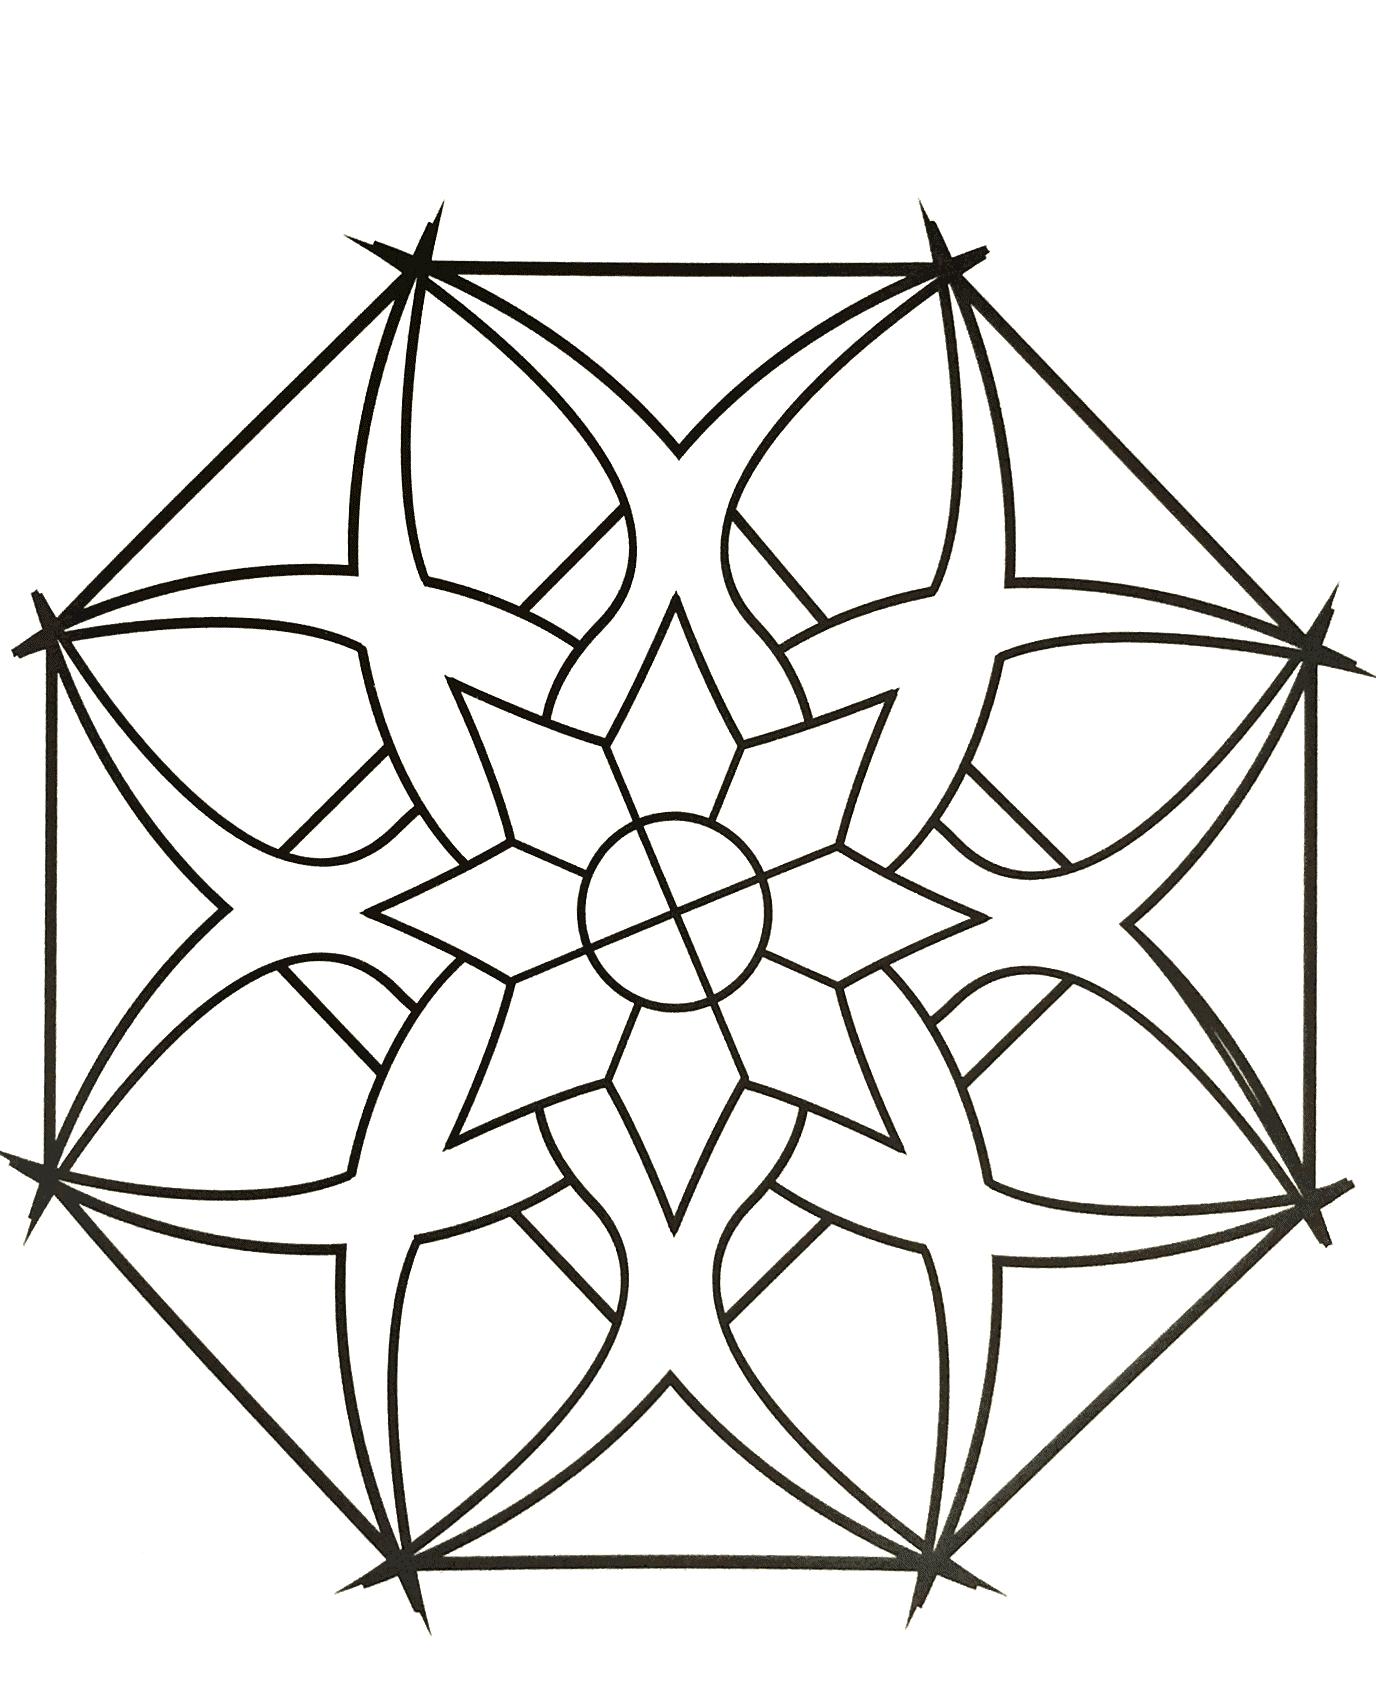 Mandalas A Imprimer Gratuit 69 - Mandalas De Difficulté serapportantà Image Zen A Imprimer